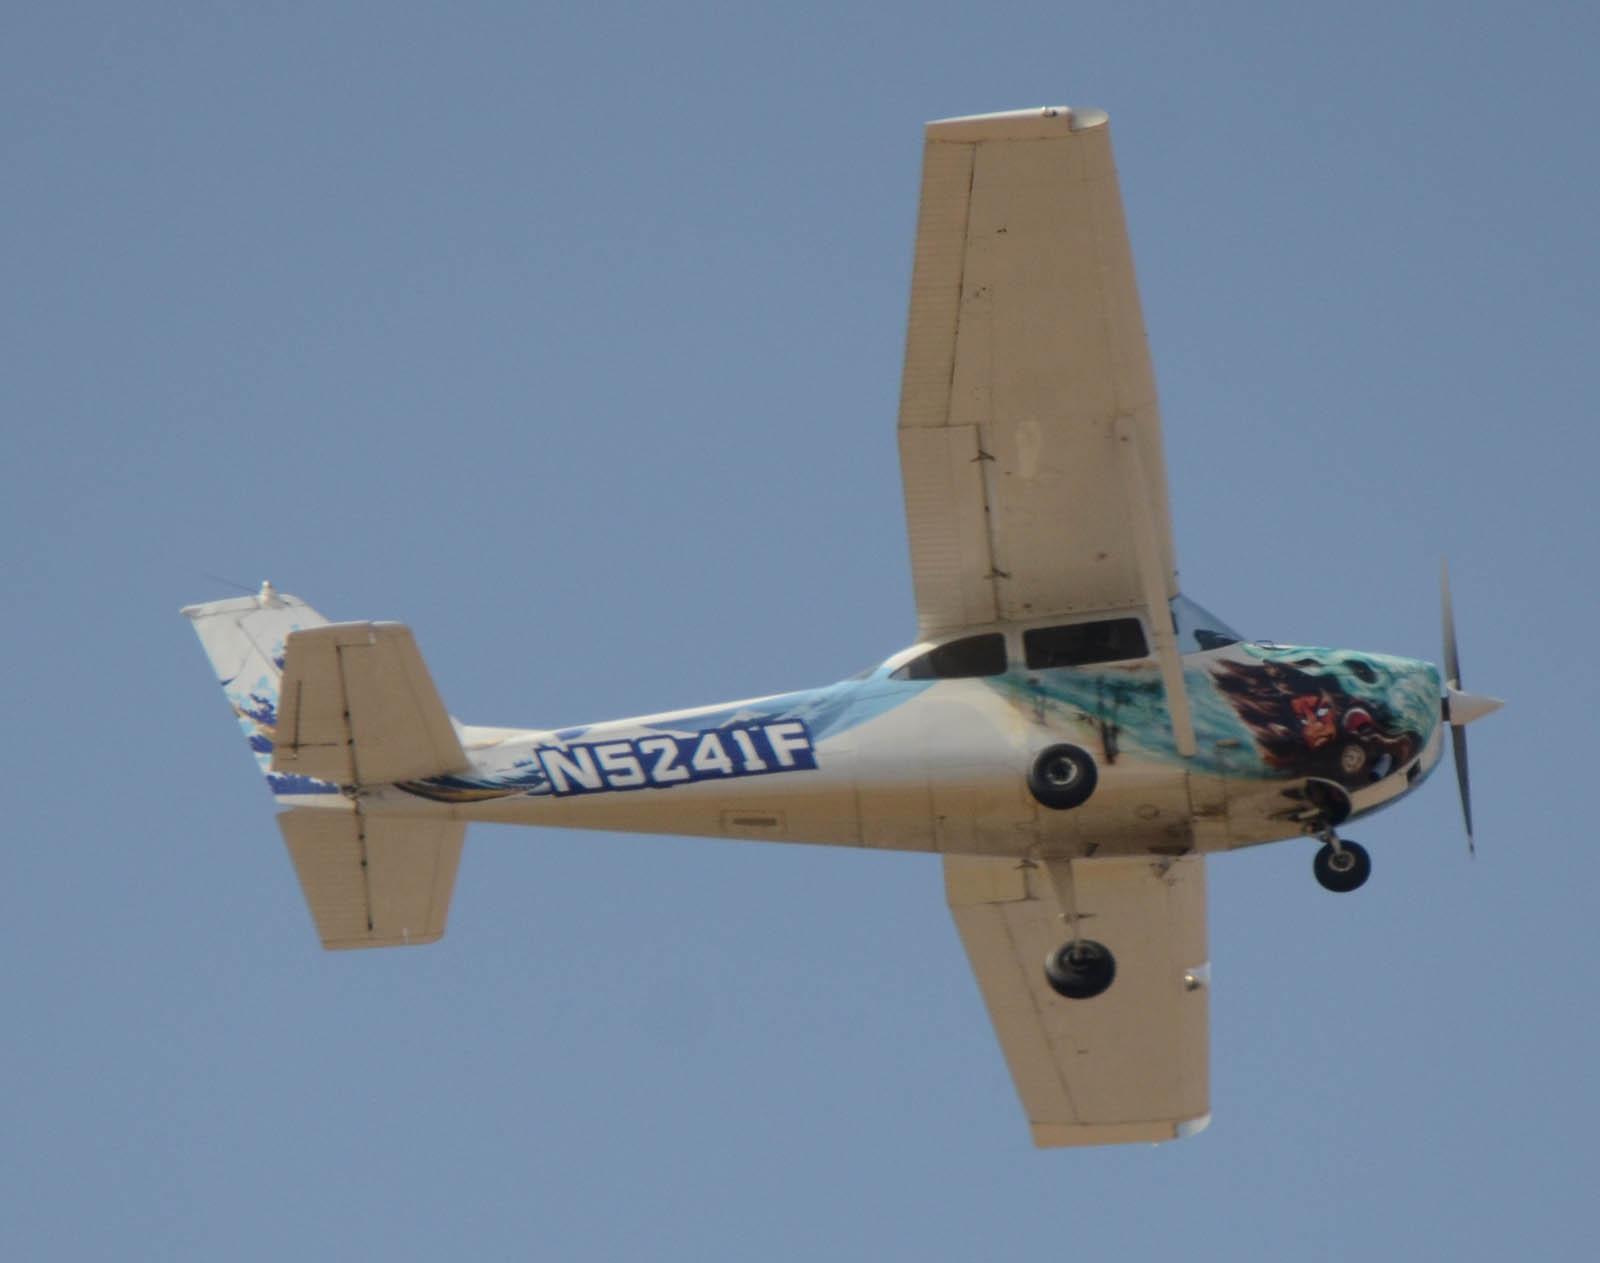 Cessna130303g797